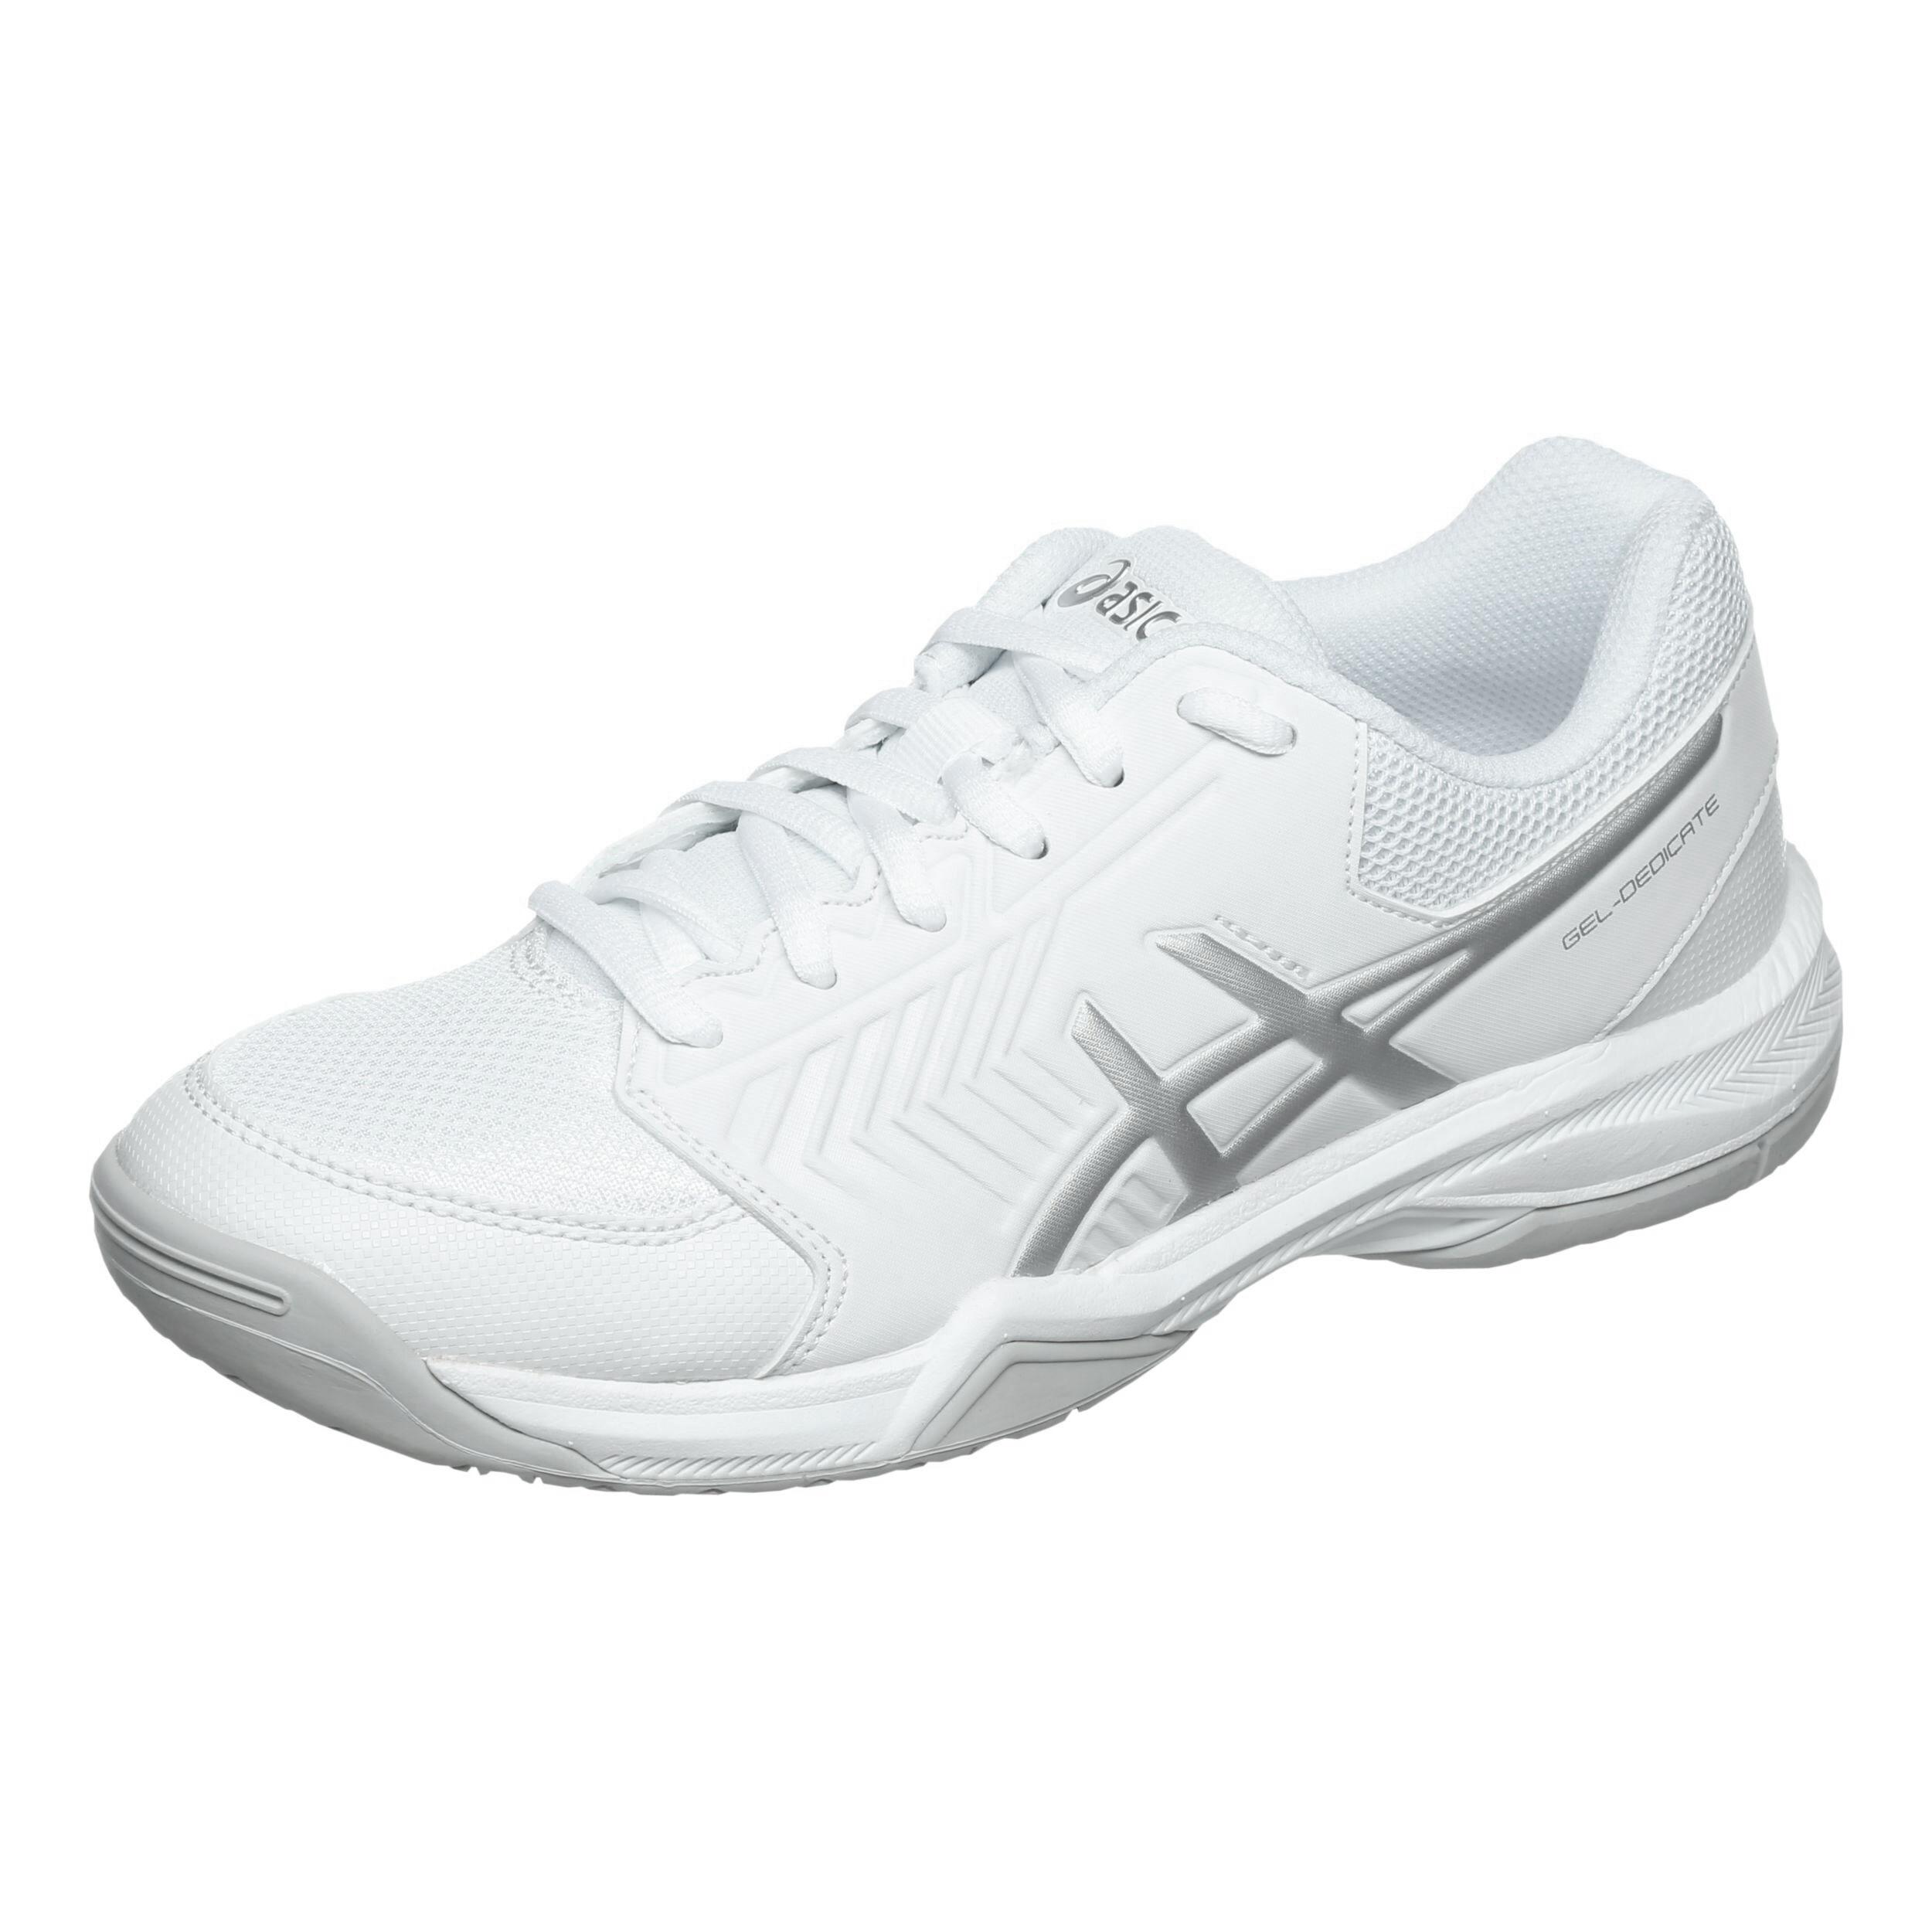 Asics Gel Dedicate 5 Chaussures Toutes Surfaces Femmes